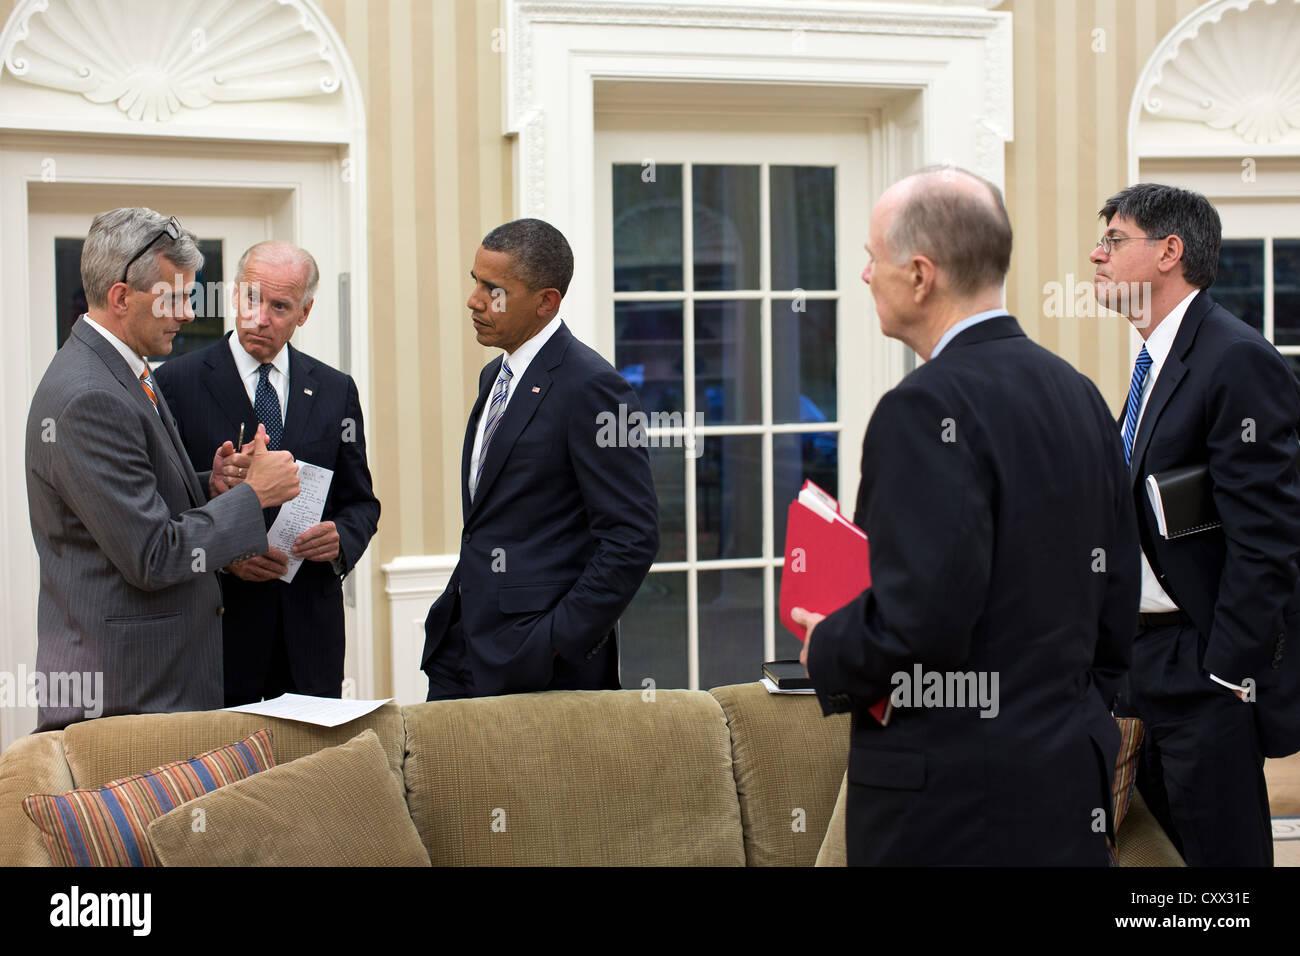 US President Barack Obama and Vice President Joe Biden talk with senior advisors September 11, 2012 in the Oval - Stock Image